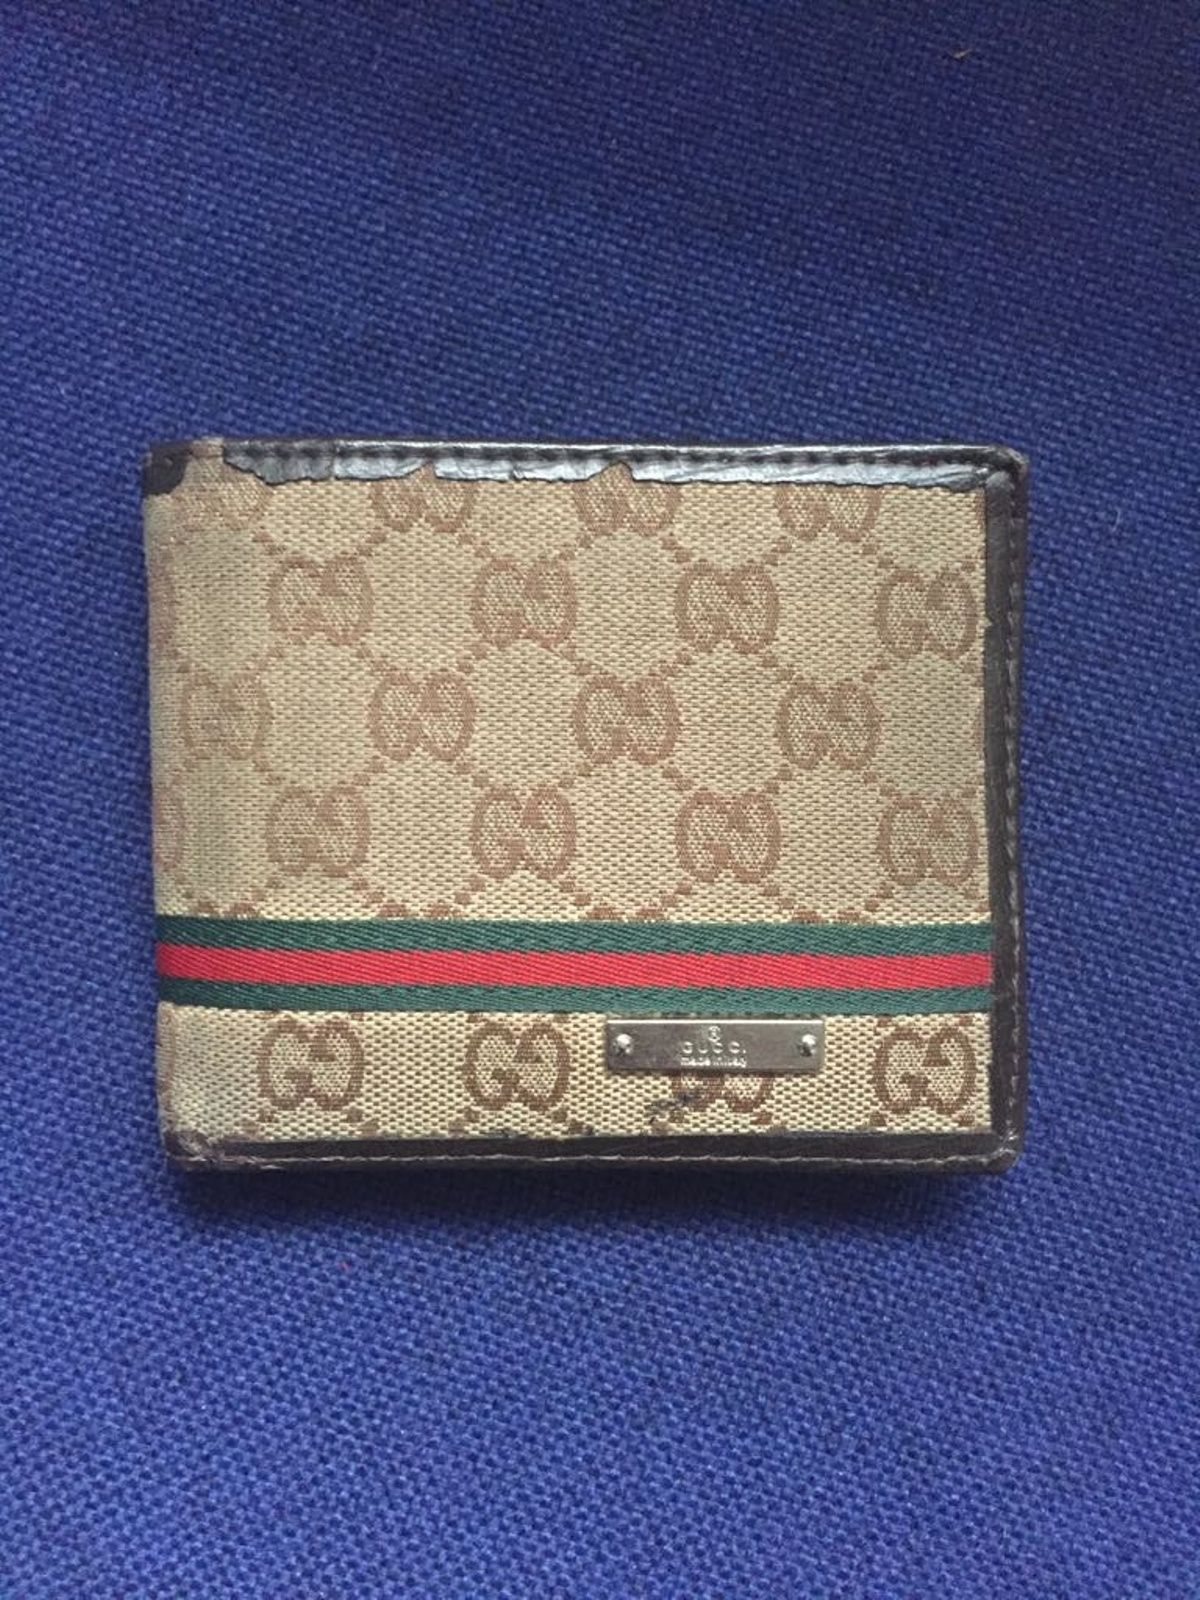 160a1baa1086 Buy Gucci Gucci Wallet, Size: ONE SIZE, Description: Gucci Wallet, cond  8/10, 100% original. Ask me for more photos. , Seller: gulottafrank, ...